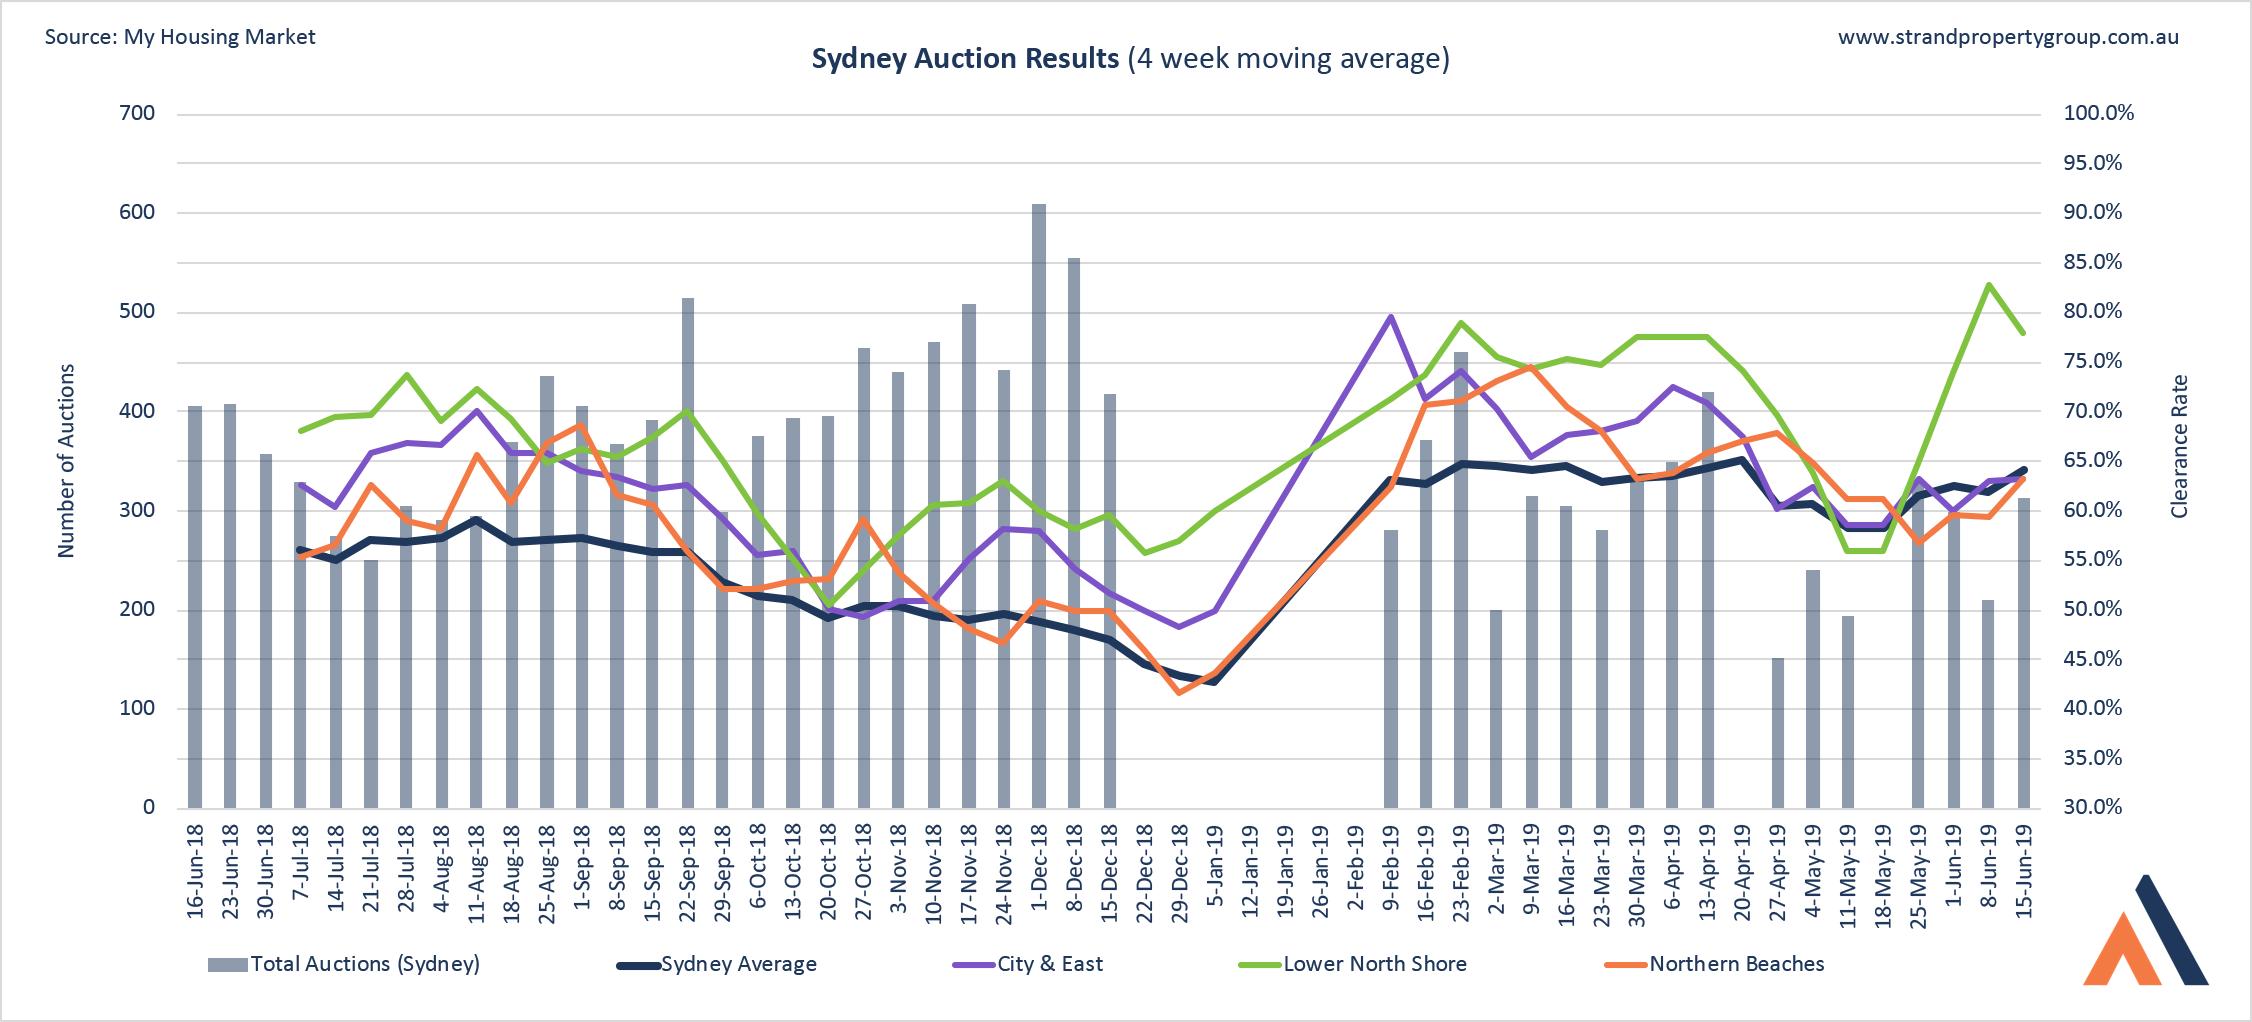 Sydney Auction Results - 15 JUN 2019